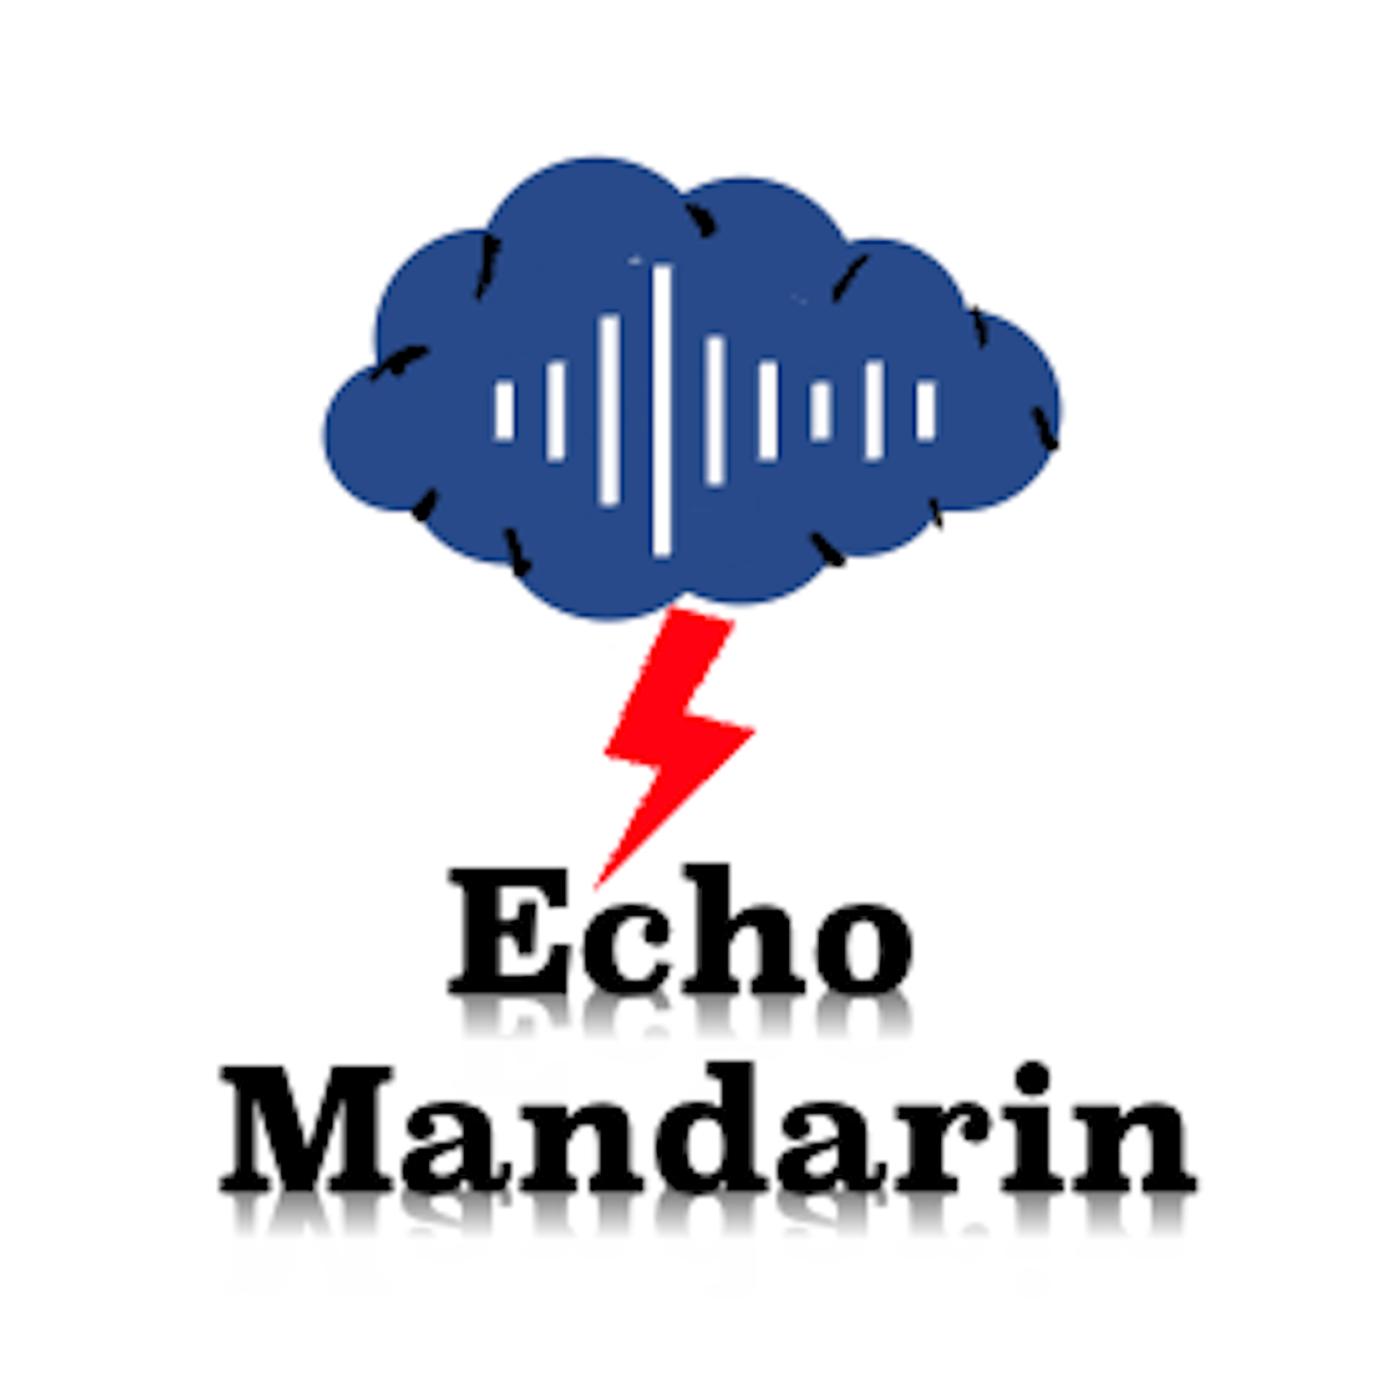 Echo Mandarin